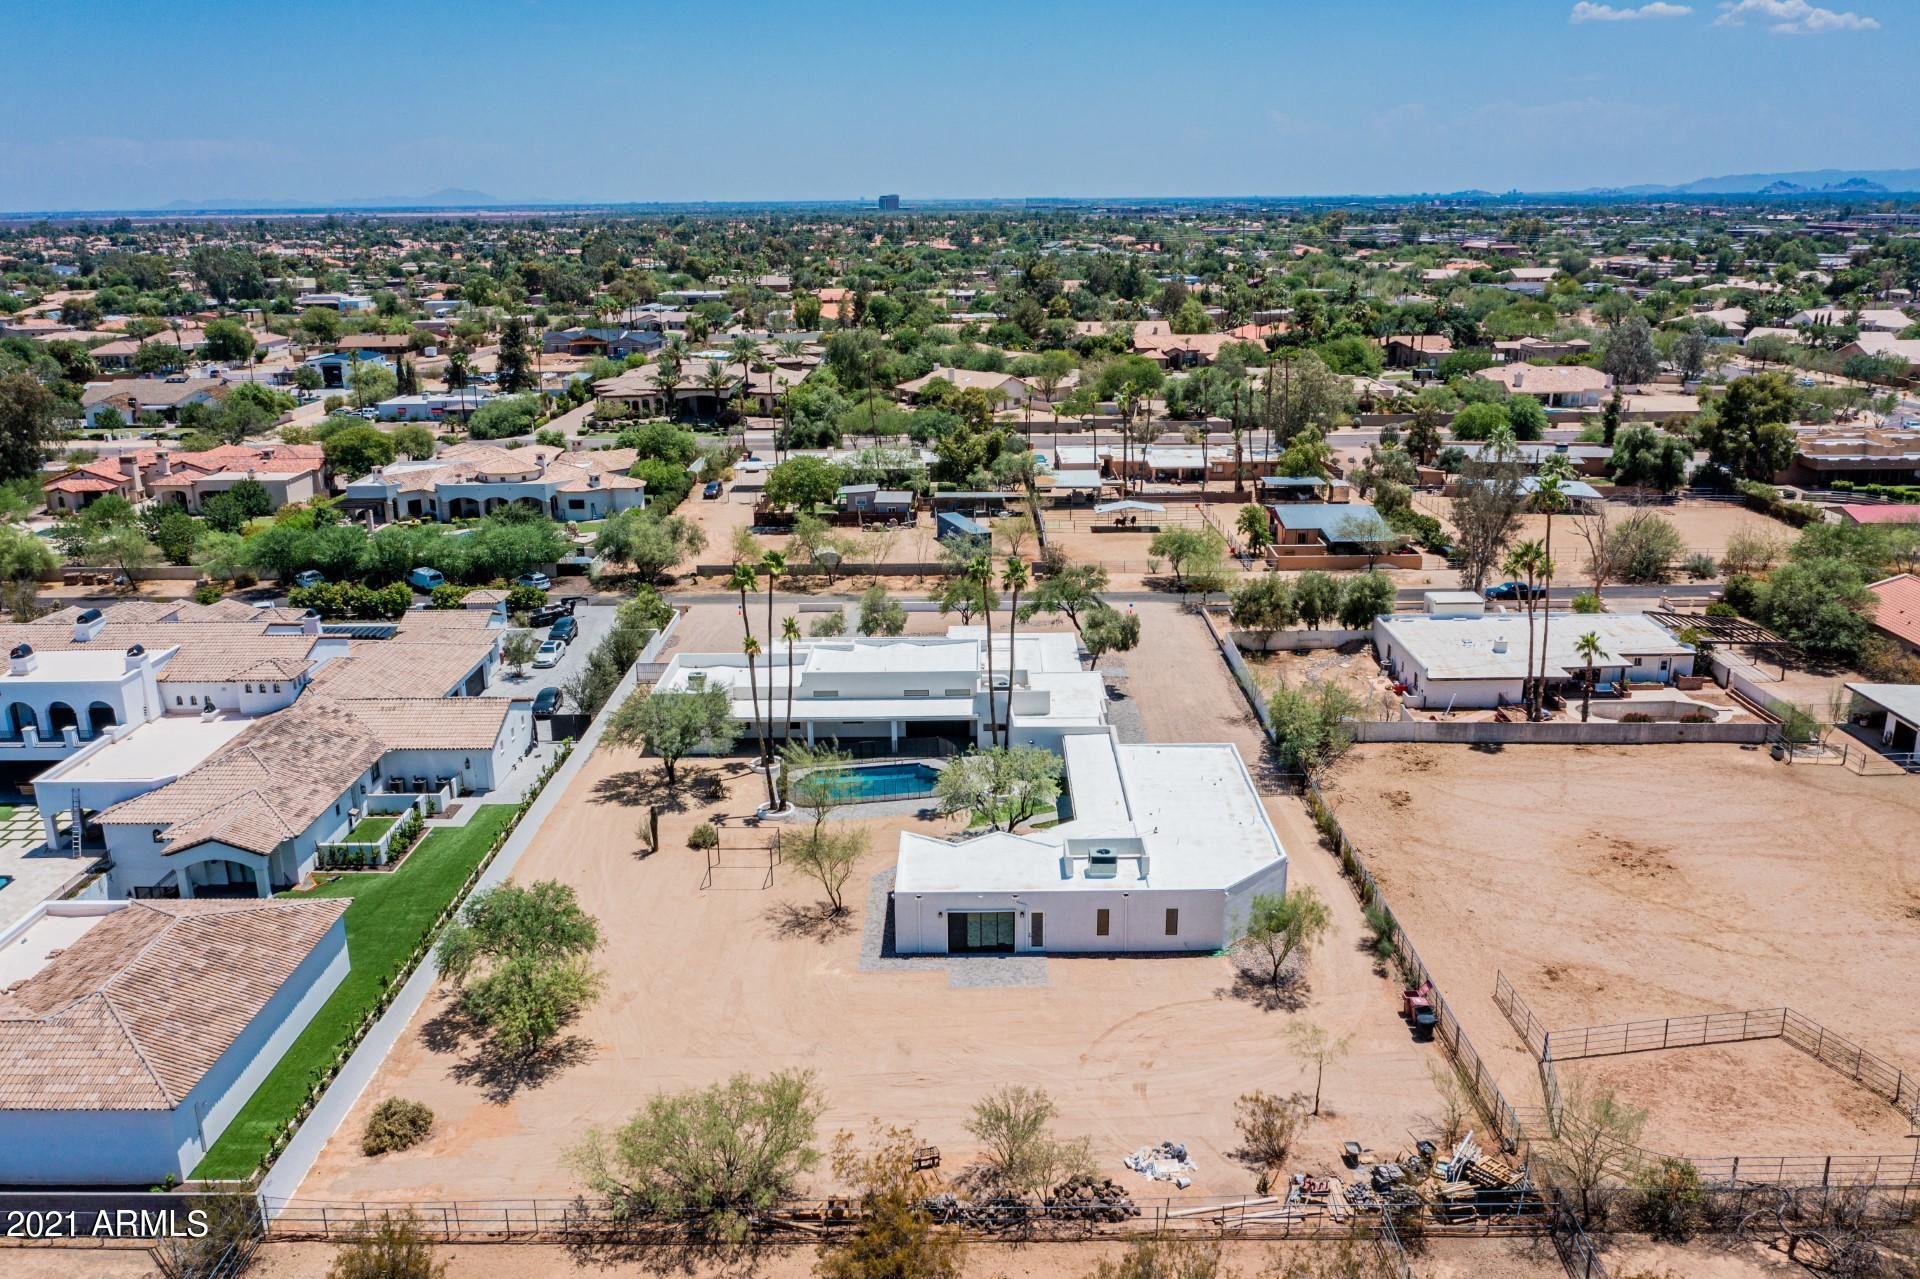 Photo of 9626 E KALIL Drive, Scottsdale, AZ 85260 (MLS # 6249842)